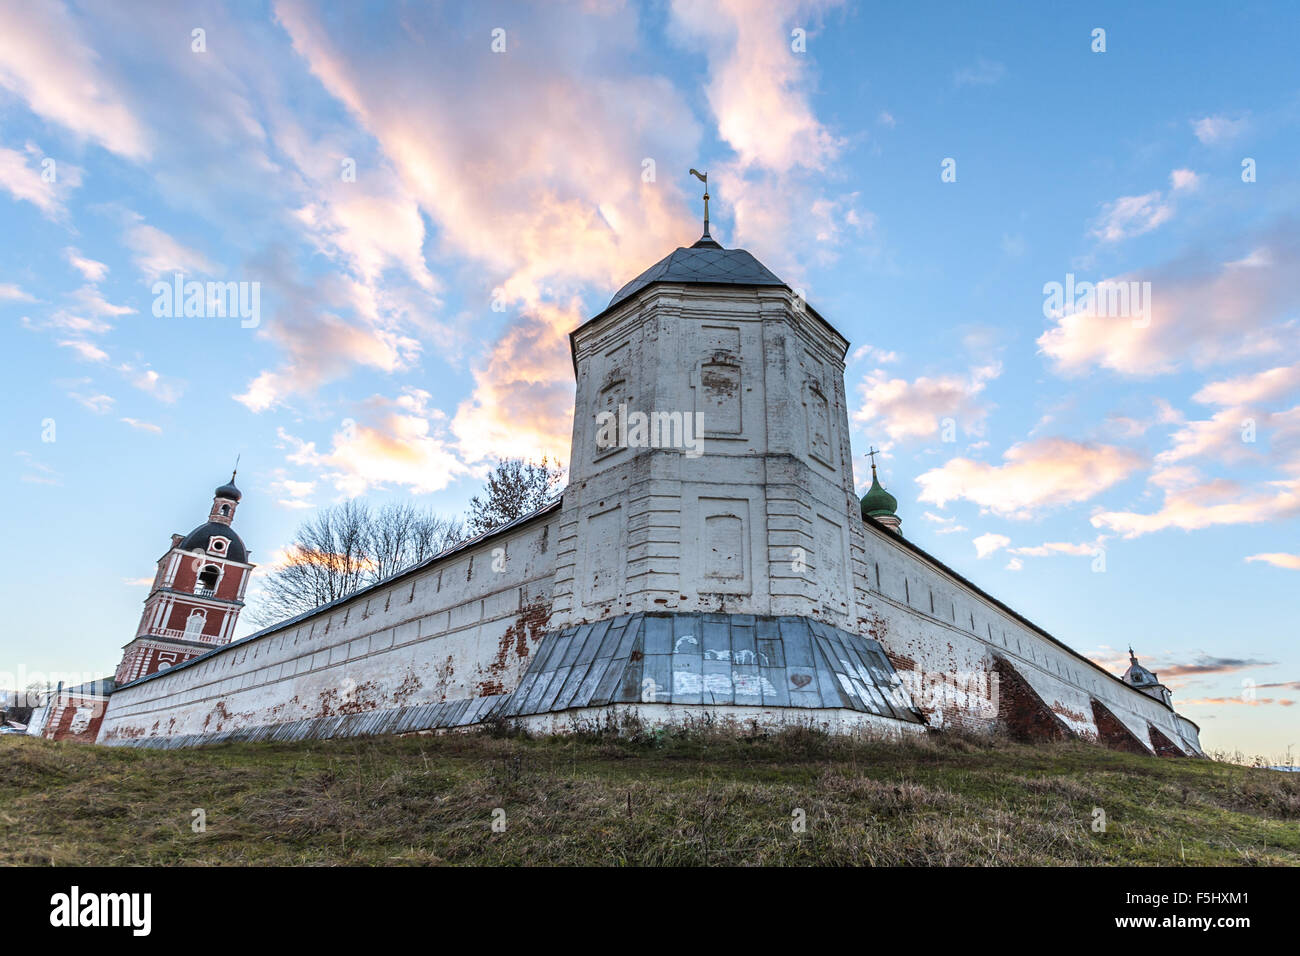 Pereslavl-Zalessky, Russia - November 03, 2015: Goritsky Monastery of Dormition. Look on the Northeast watchtower. - Stock Image